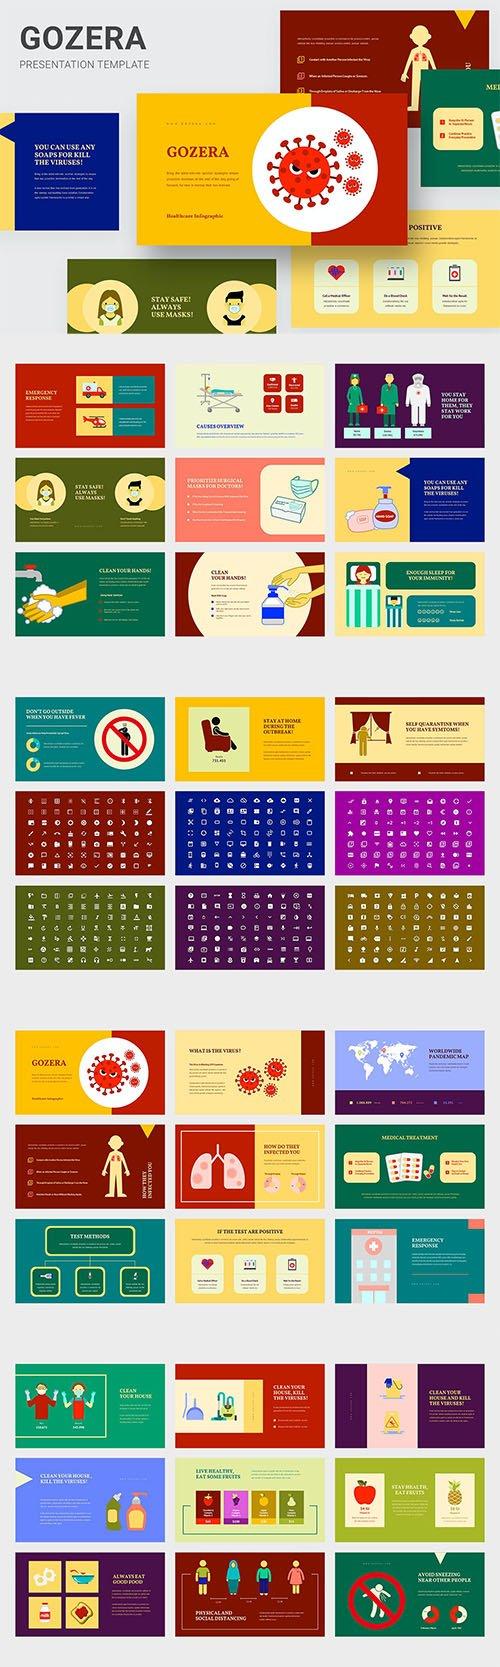 Gozera - Healthcare Infographic Powerpoint, Keynote and Google Slides